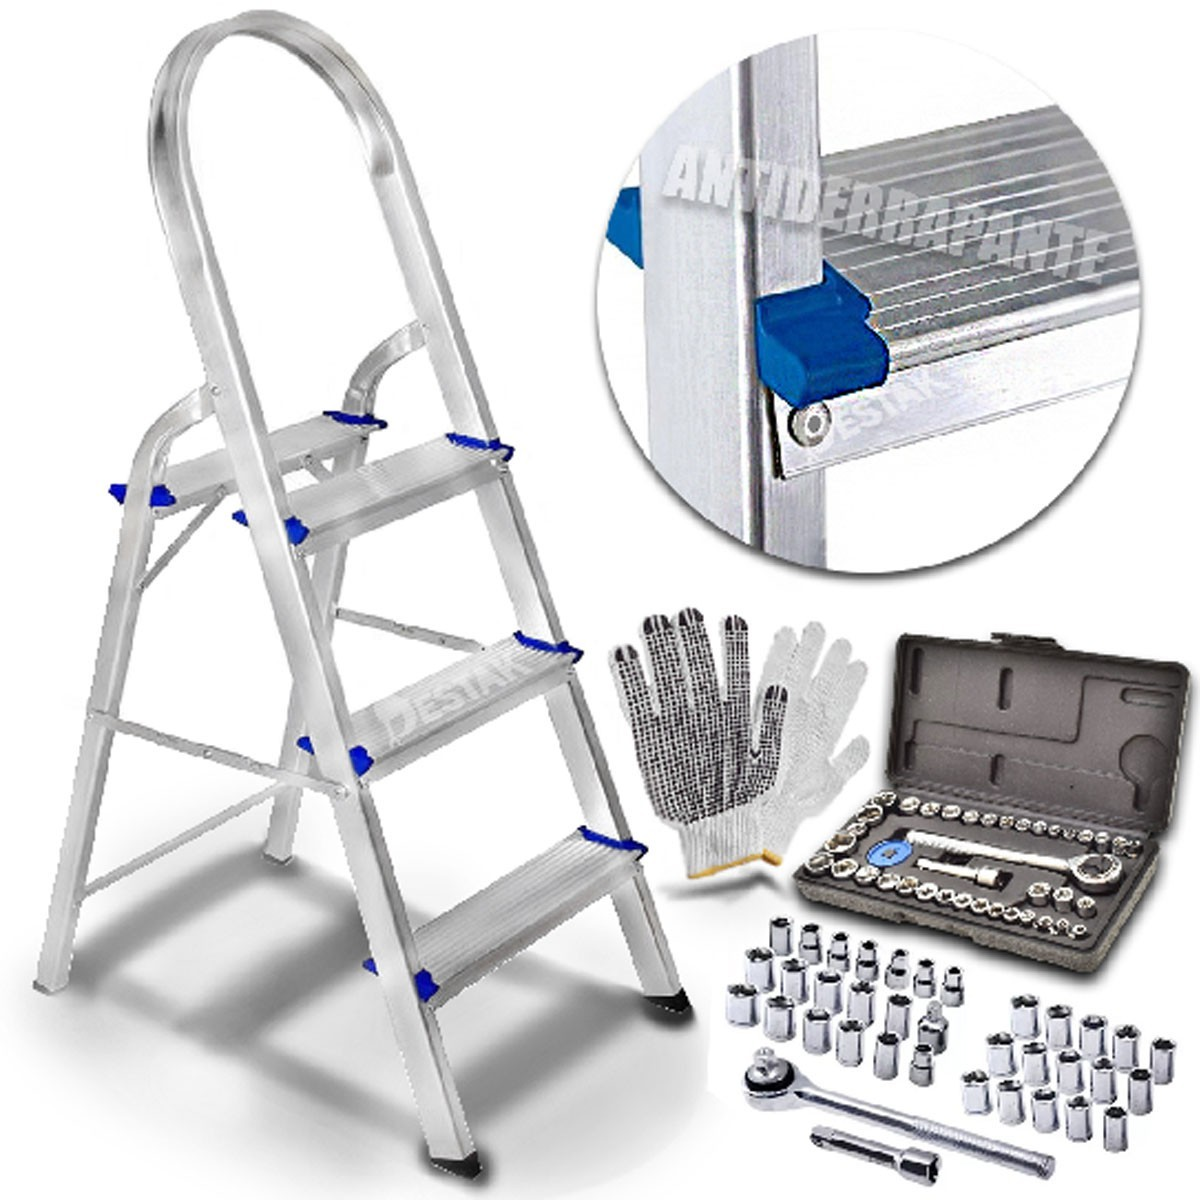 Kit Maleta 49 Ferramenta Escada Doméstica Alumínio 3 Degraus